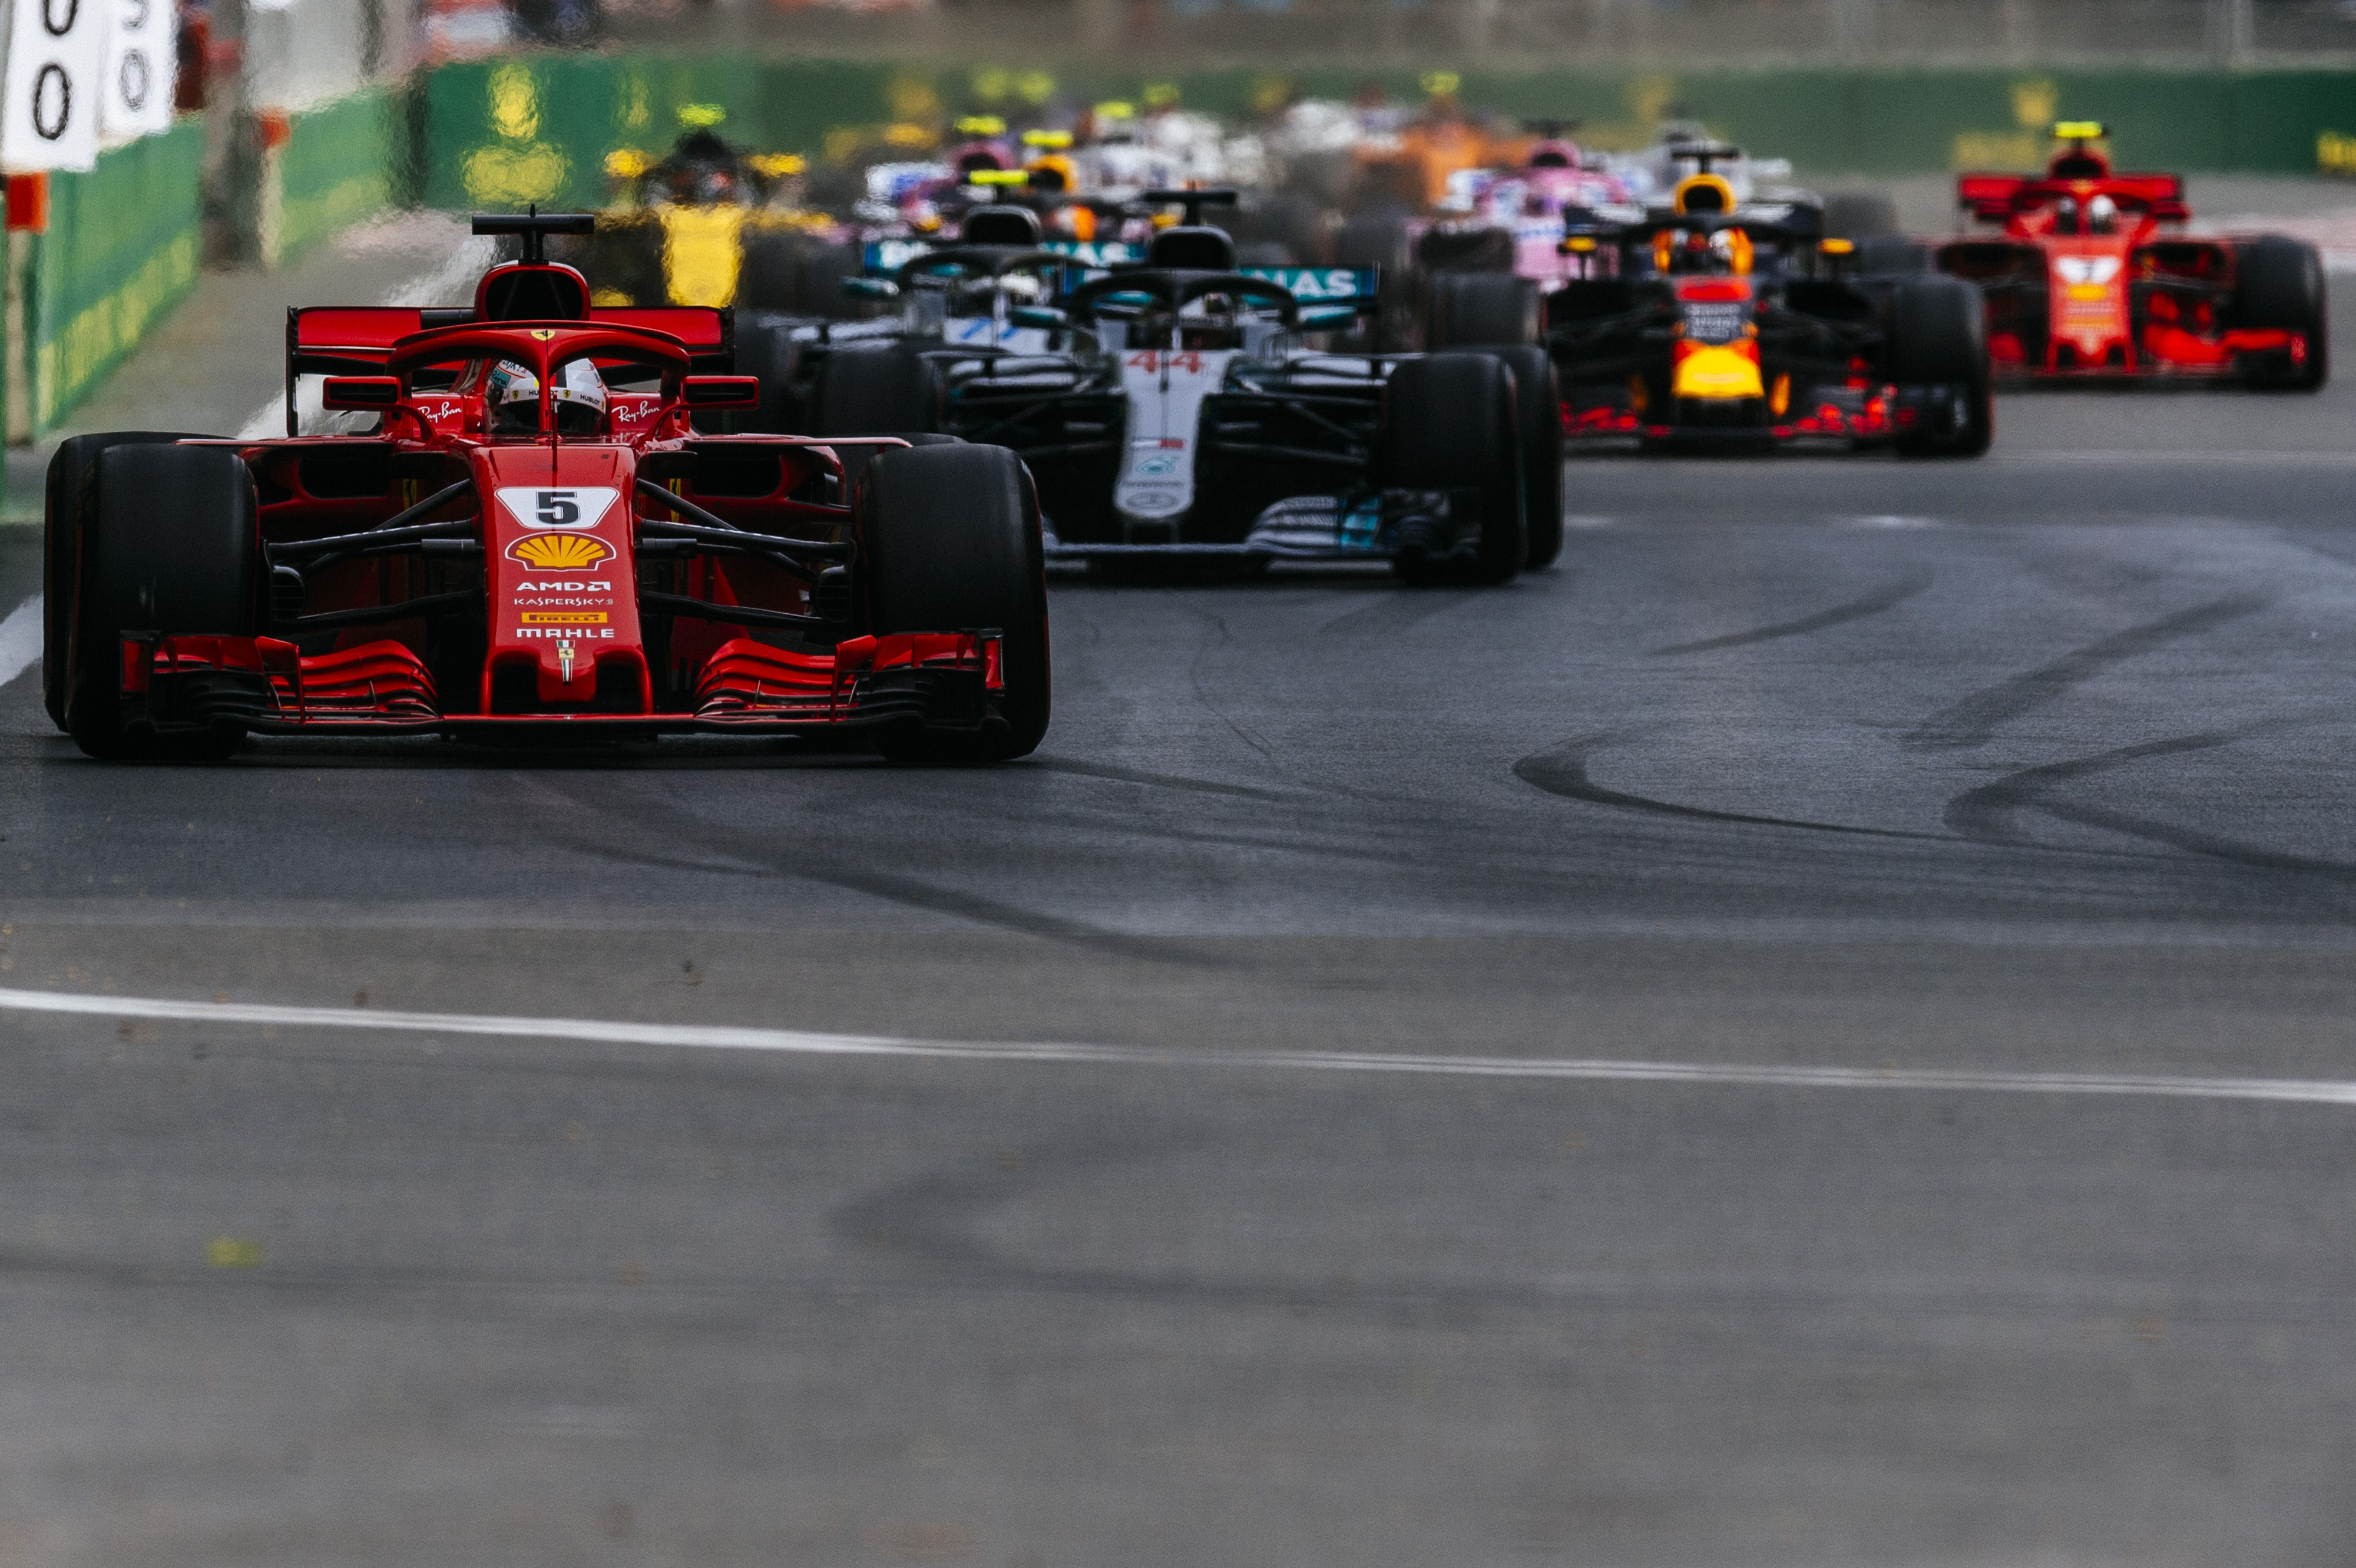 Sebastian Vettel (Ferrari) au Grand Prix d'Azerbaïdjan 2018